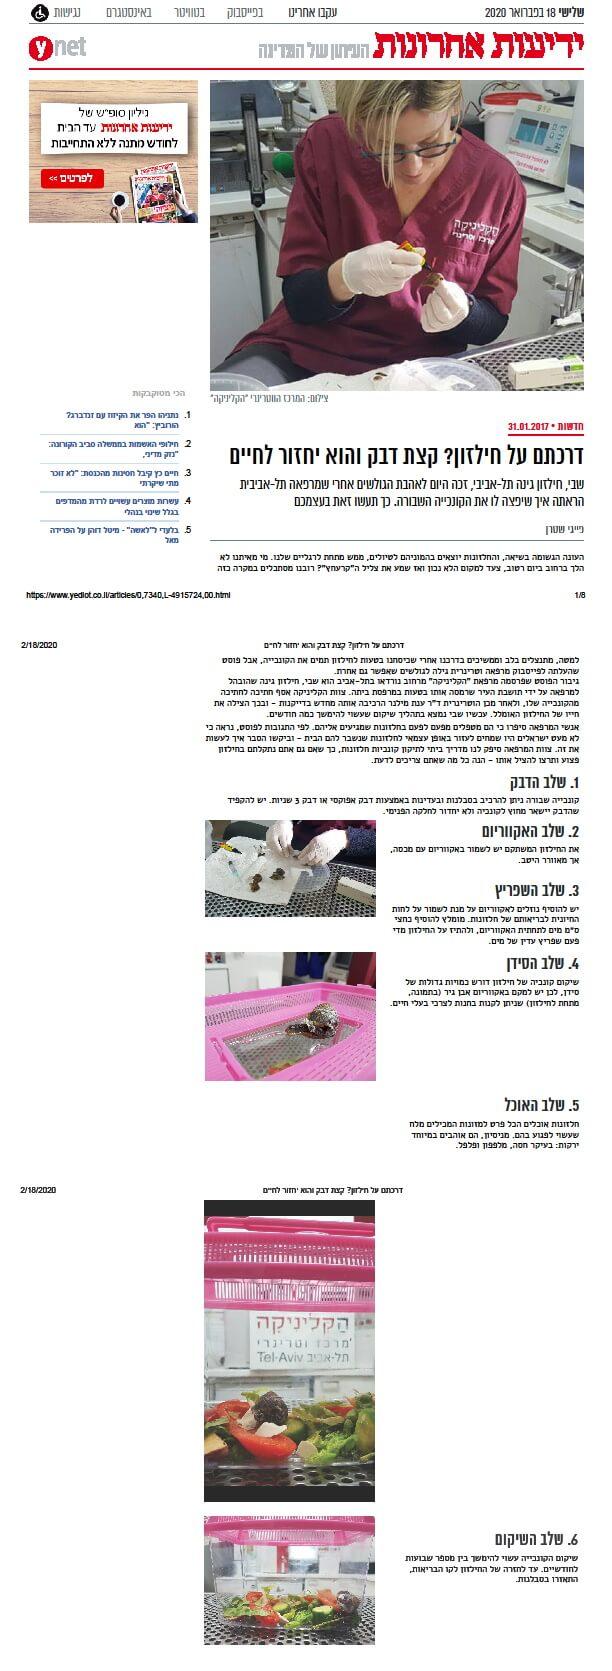 ynet: איך משקמים קונכיה של חילזון